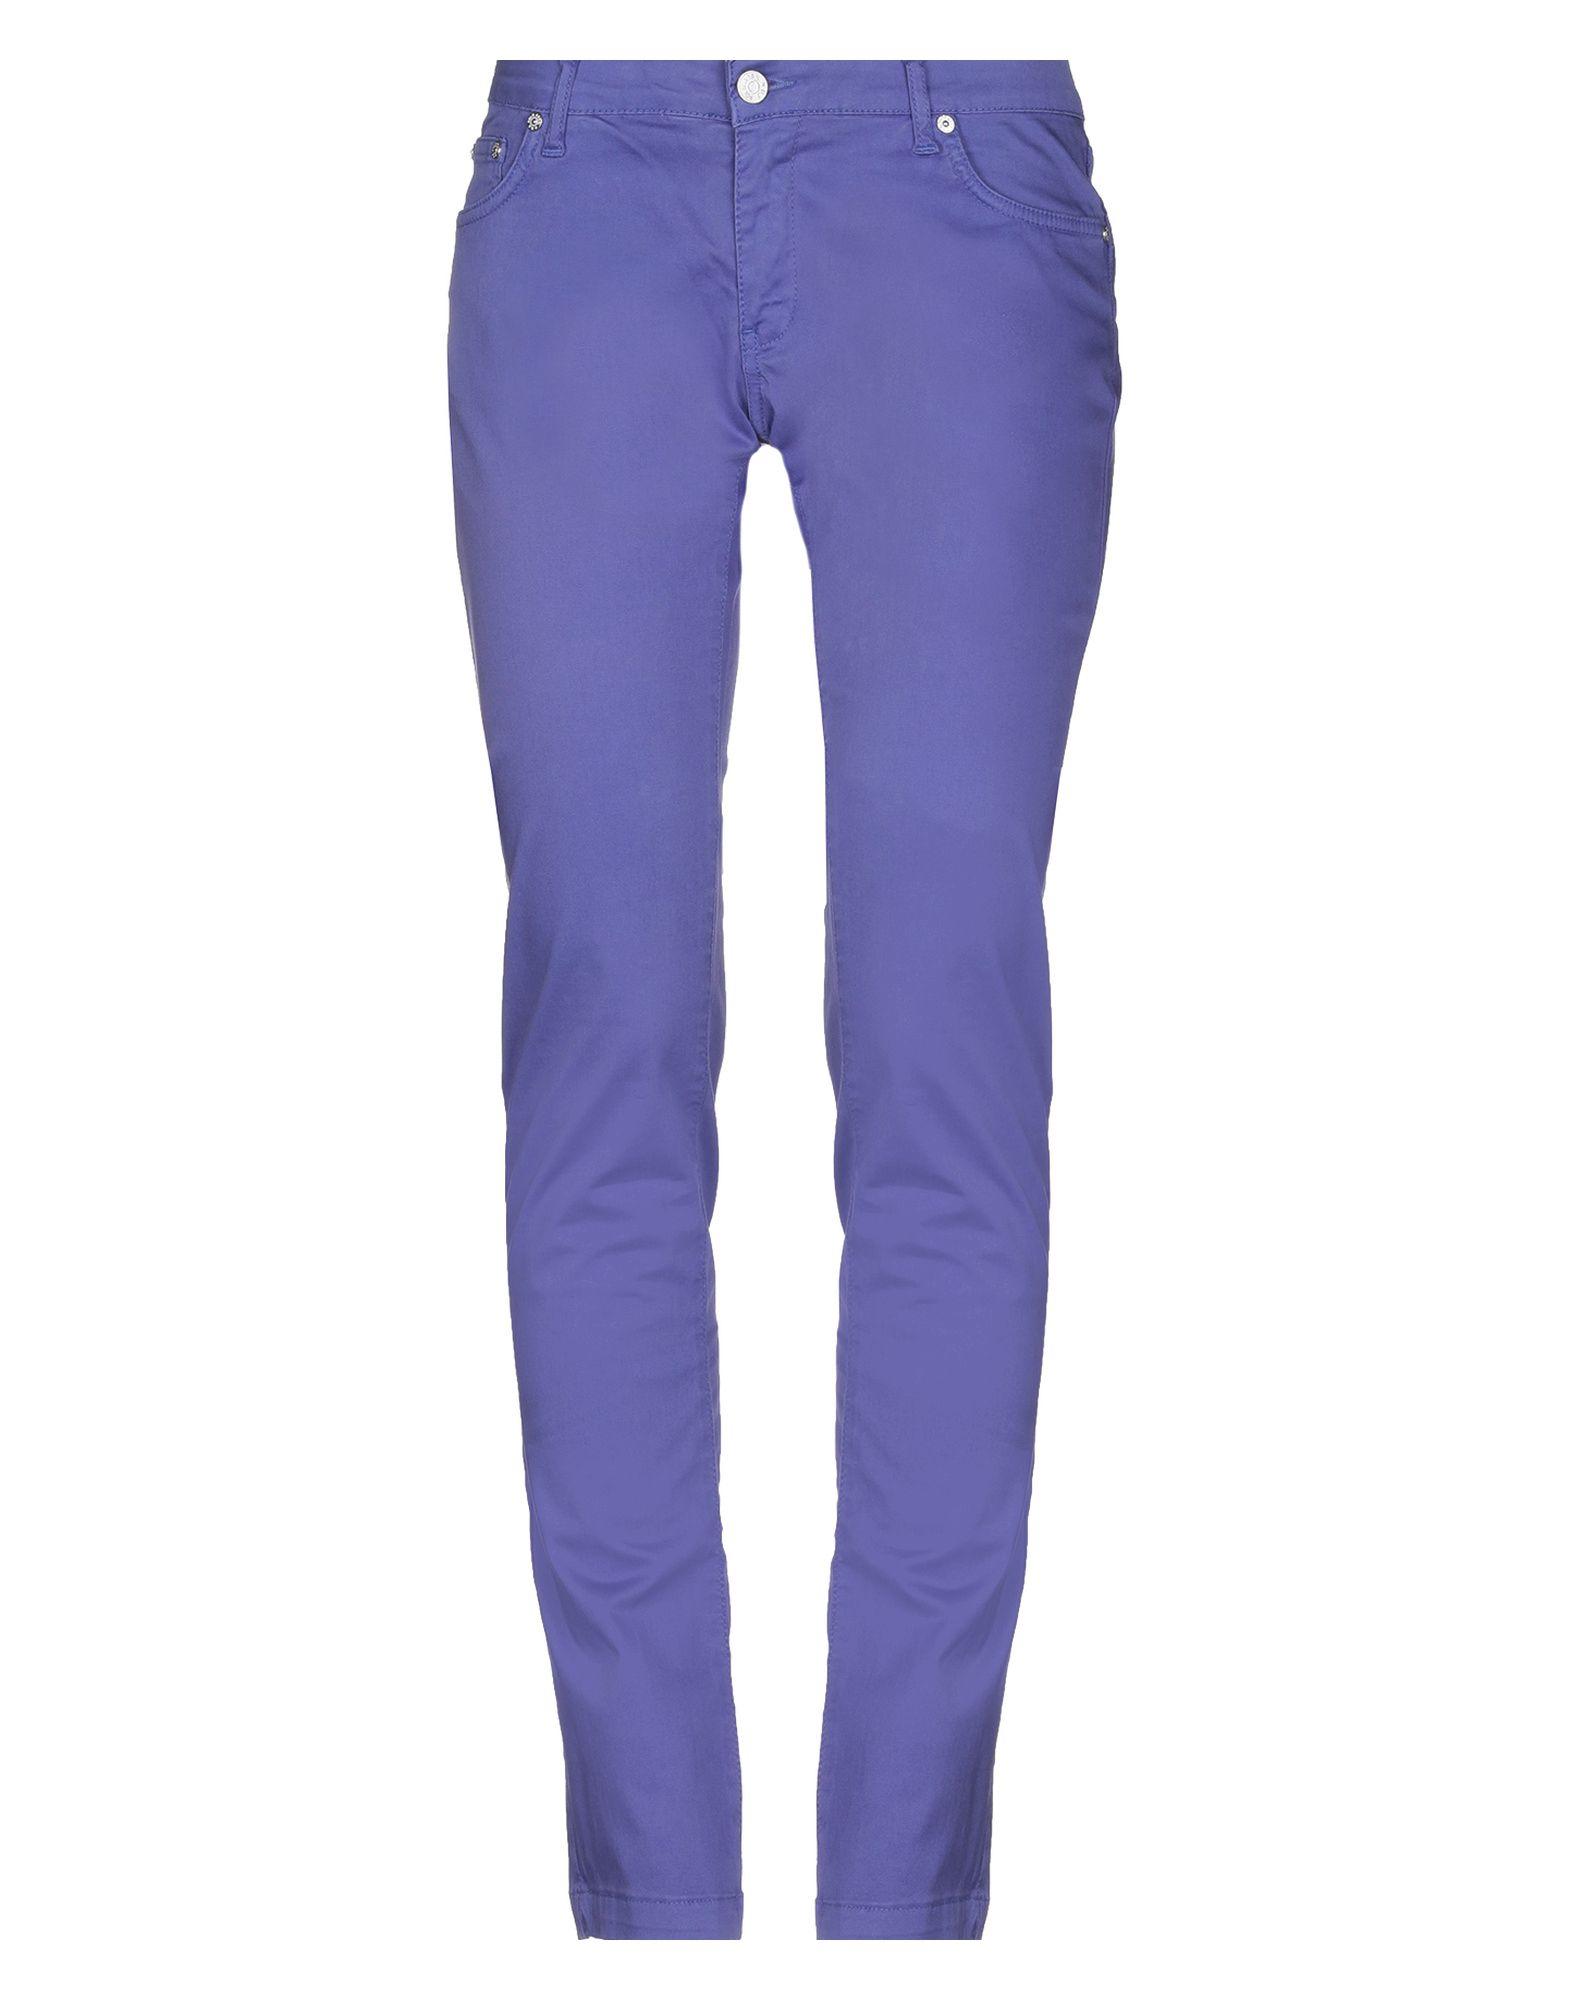 Pantalone U.S.Polo Assn. donna - 13136318IE